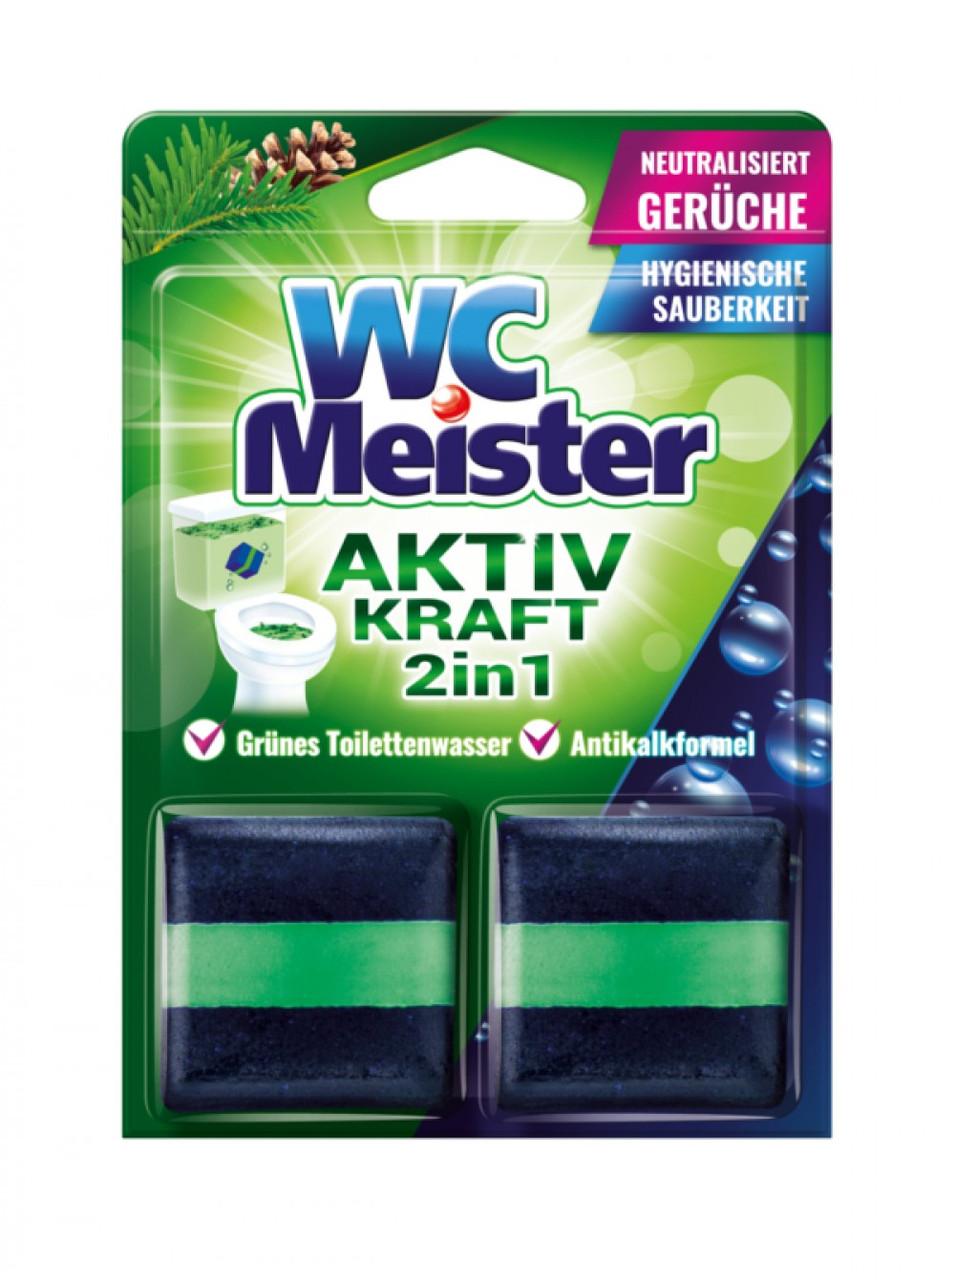 Таблетка для зливного бачка WC Meister Forest Activ kraft 2in1 2*50 г (Хвоя)